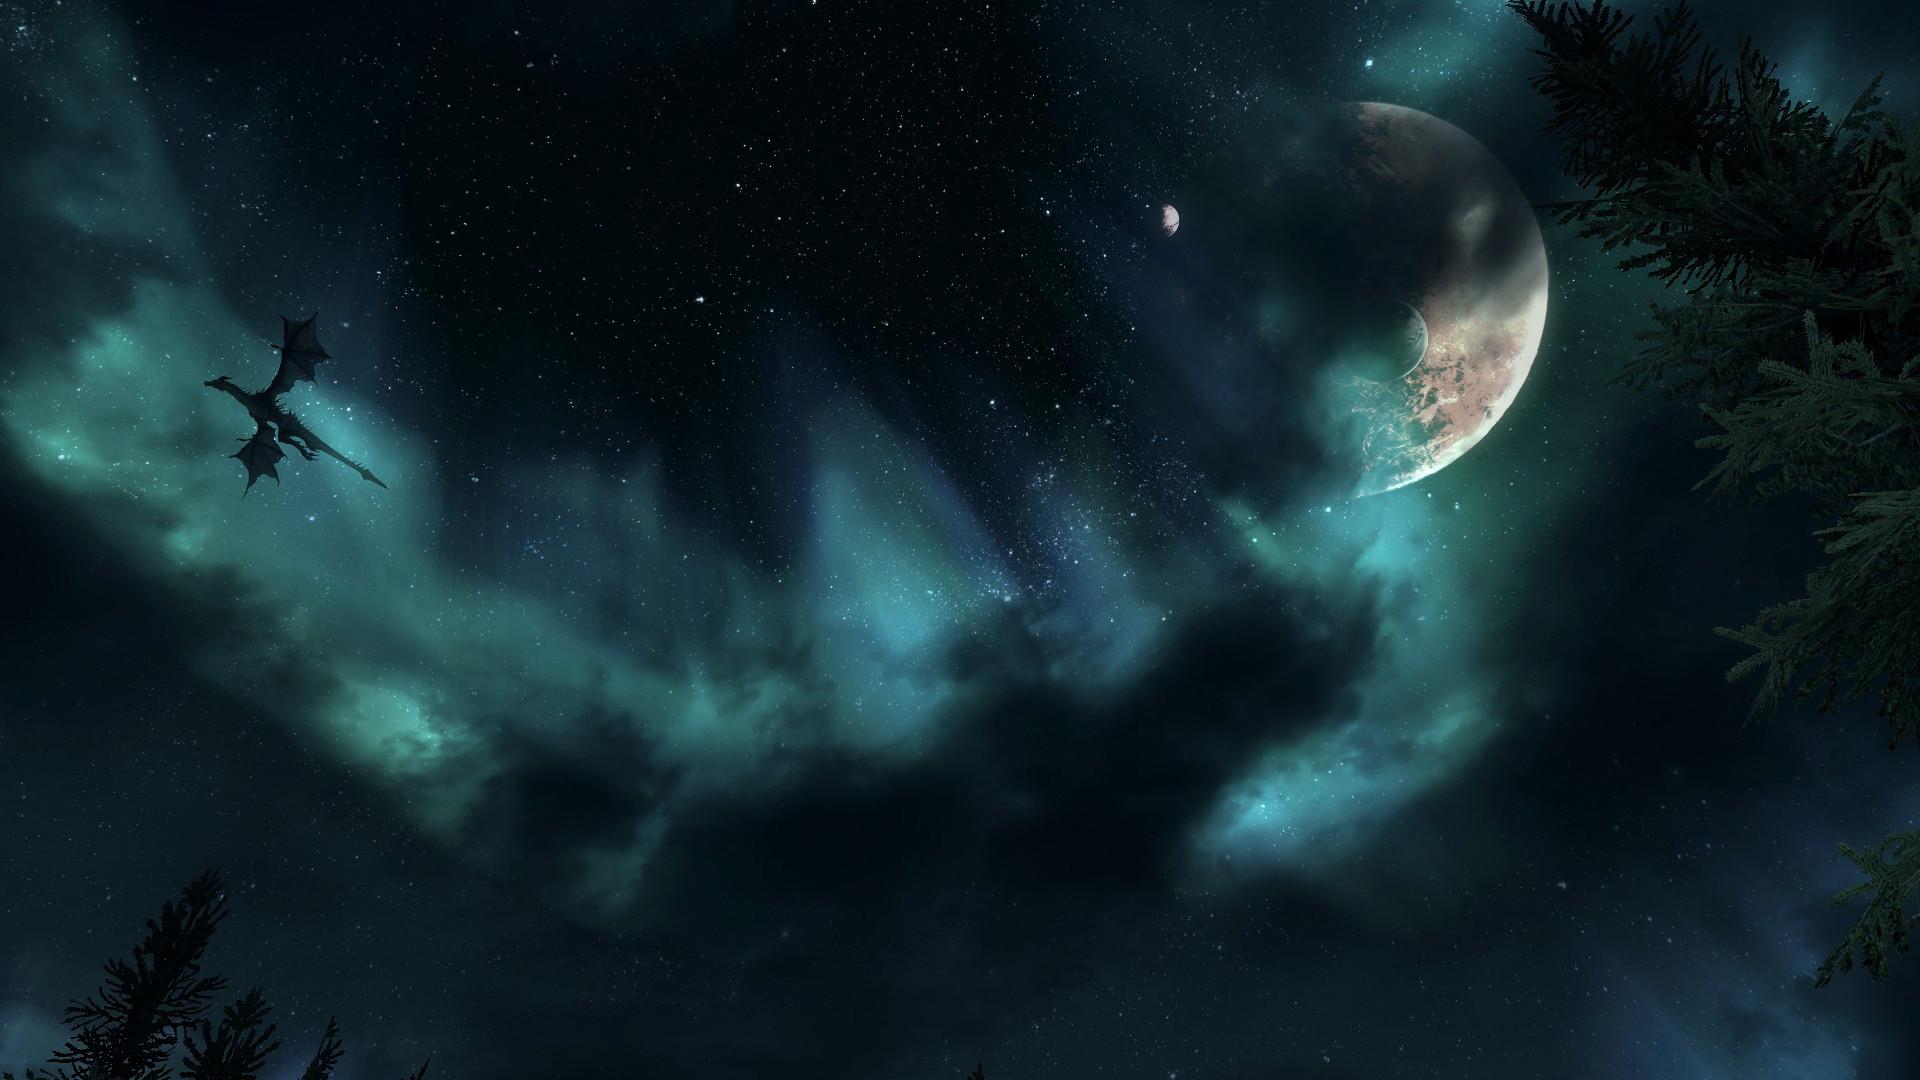 … Skyrim dragon night sky wallpaper by Mallony